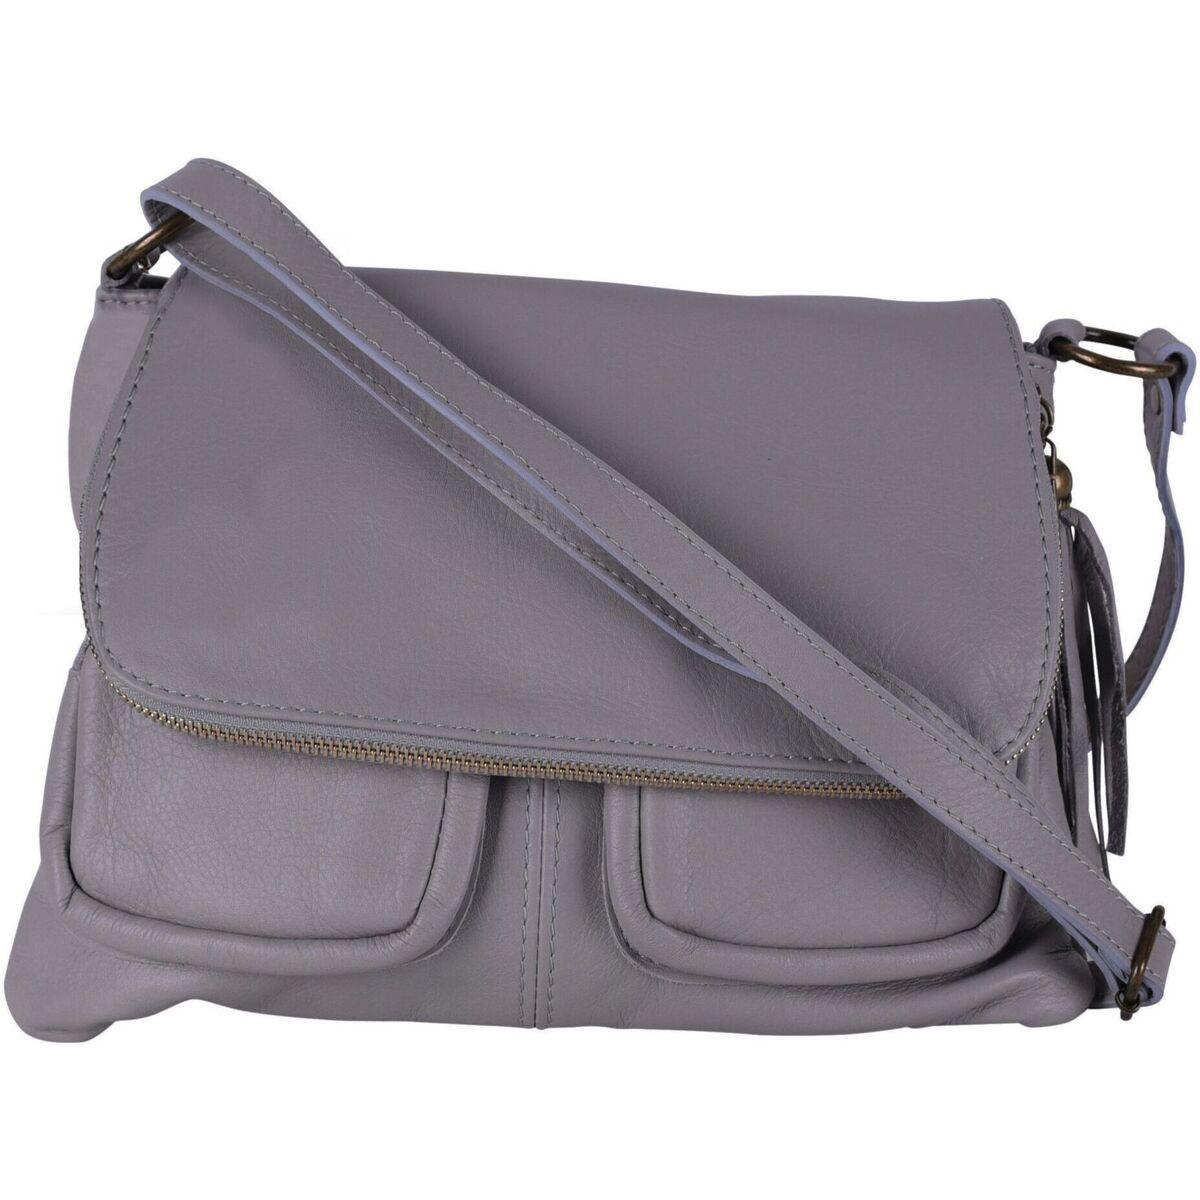 Sac A Main Bandouliere Cuir Gris : Oh my bag sac ? main cuir bandouli?re femme mod?le avril